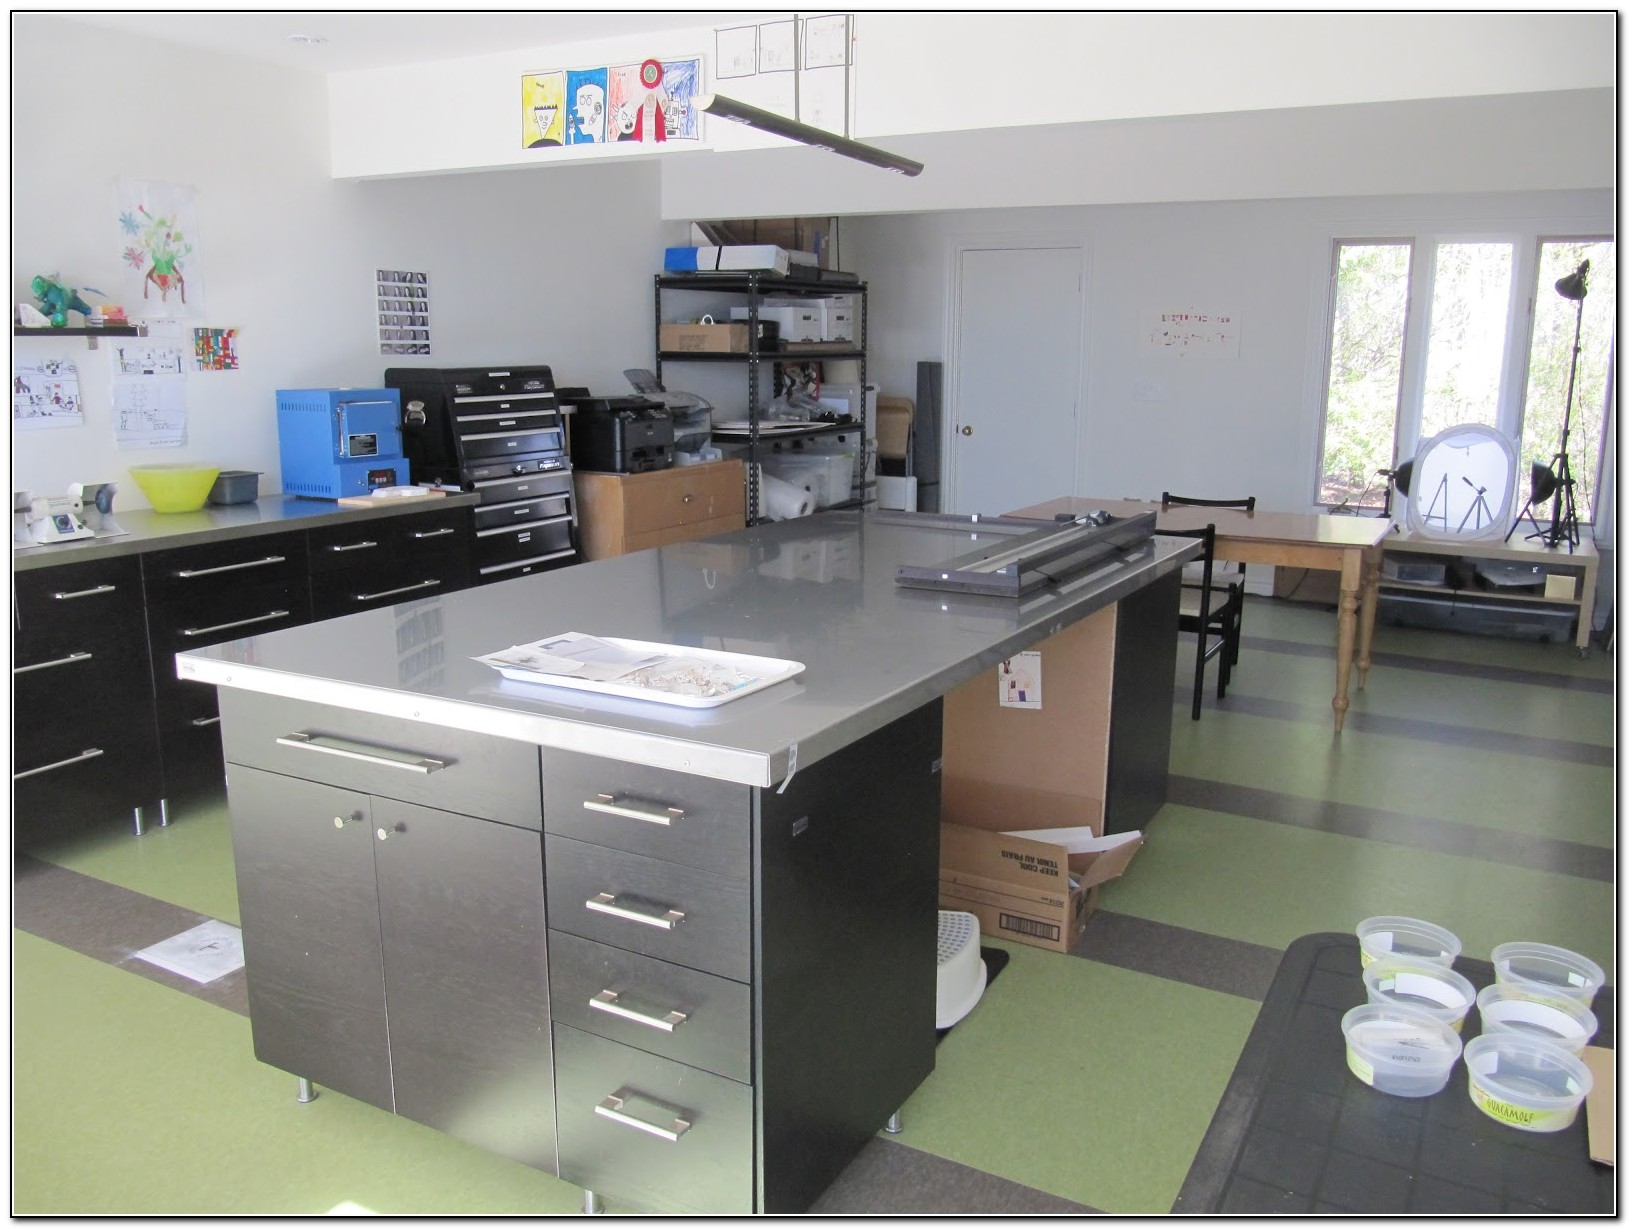 Old Metal Kitchen Cabinets Kitchen Home Design Ideas 1apxk9aqxd17178